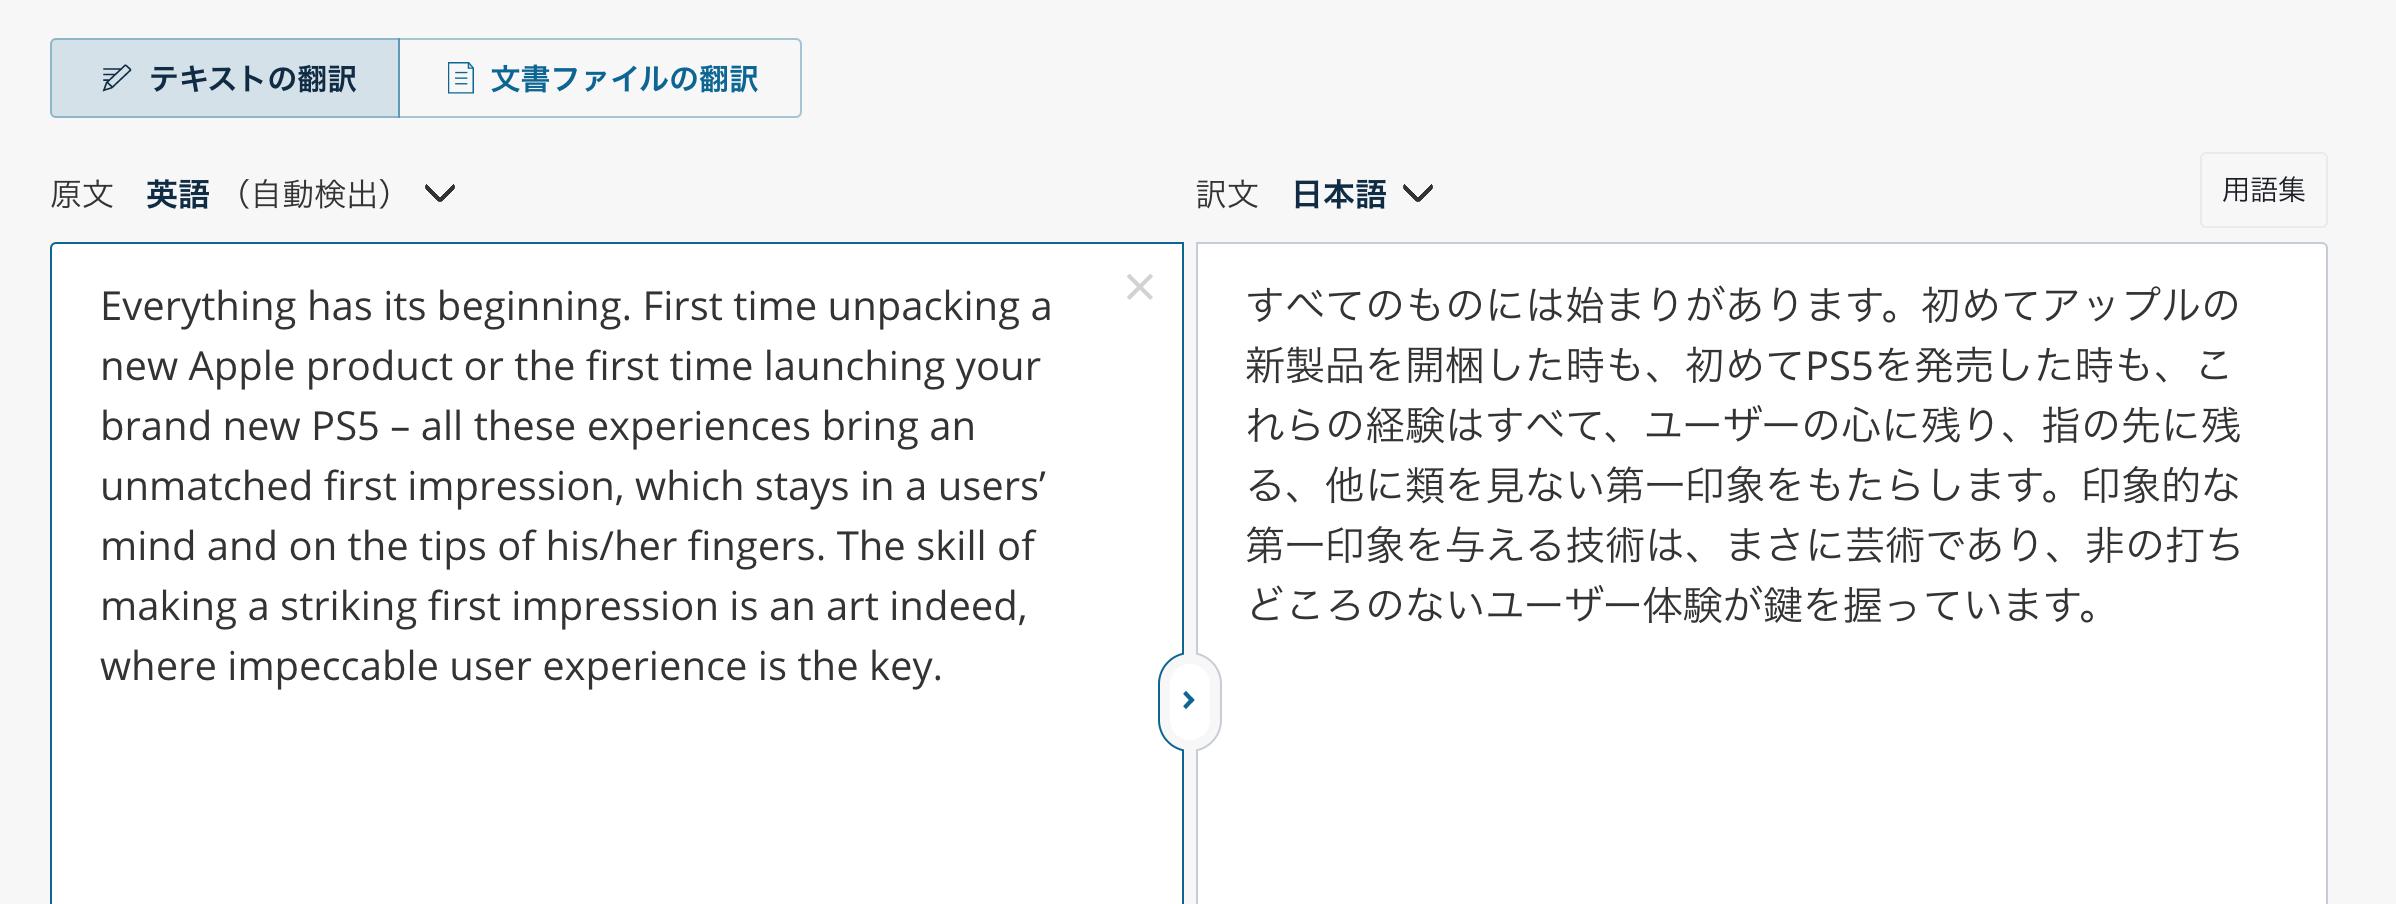 実際の翻訳結果